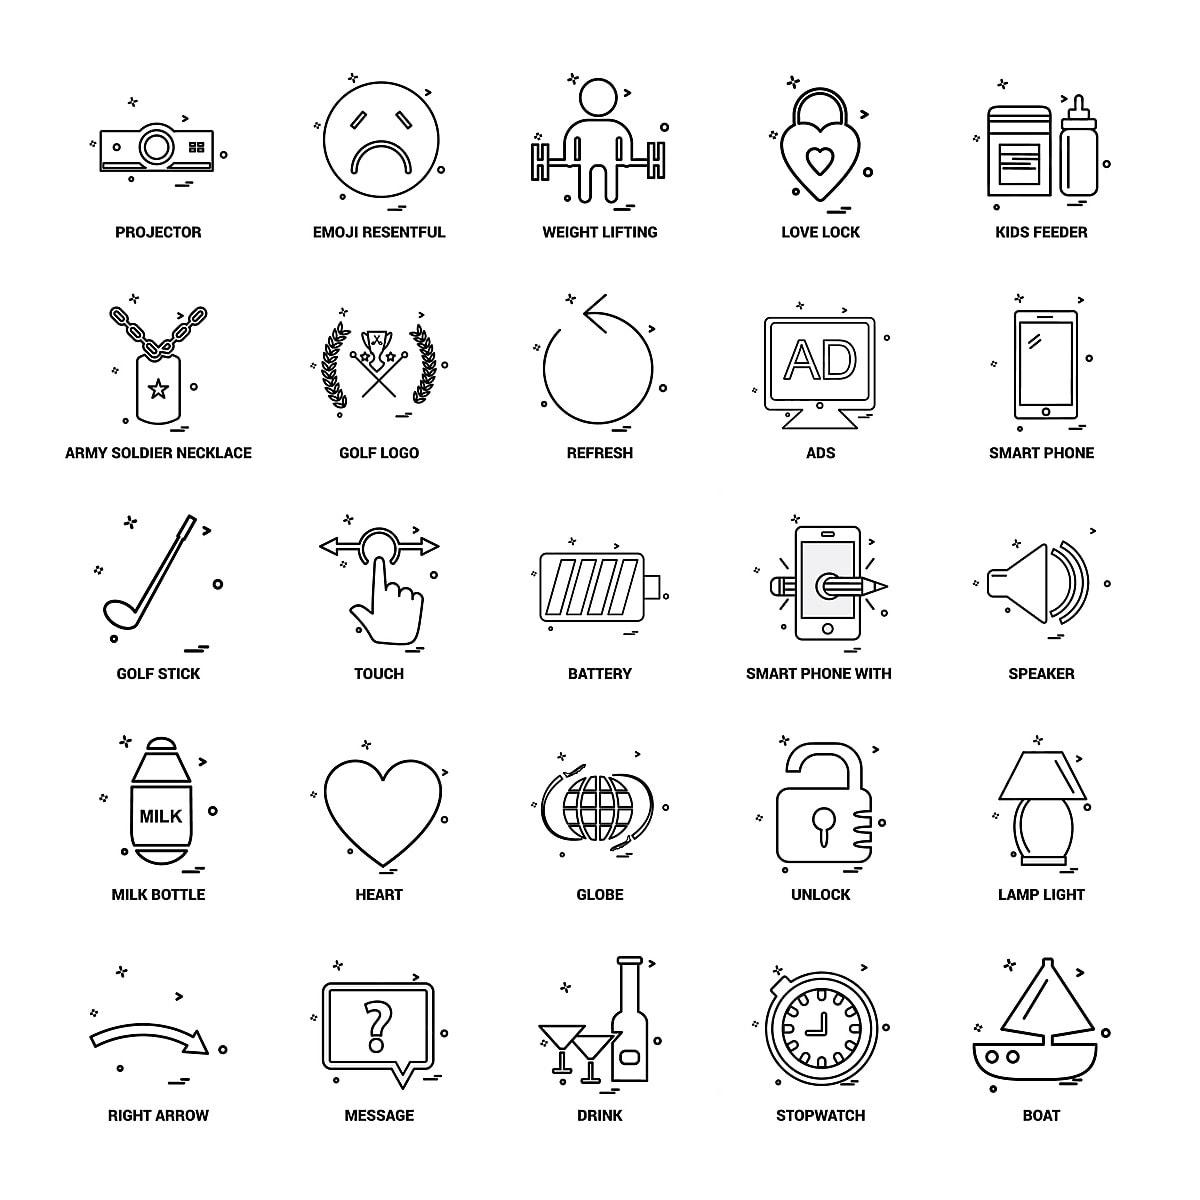 25 Concepto De Negocio Mix Linea Icon Set Army Soldier Collar